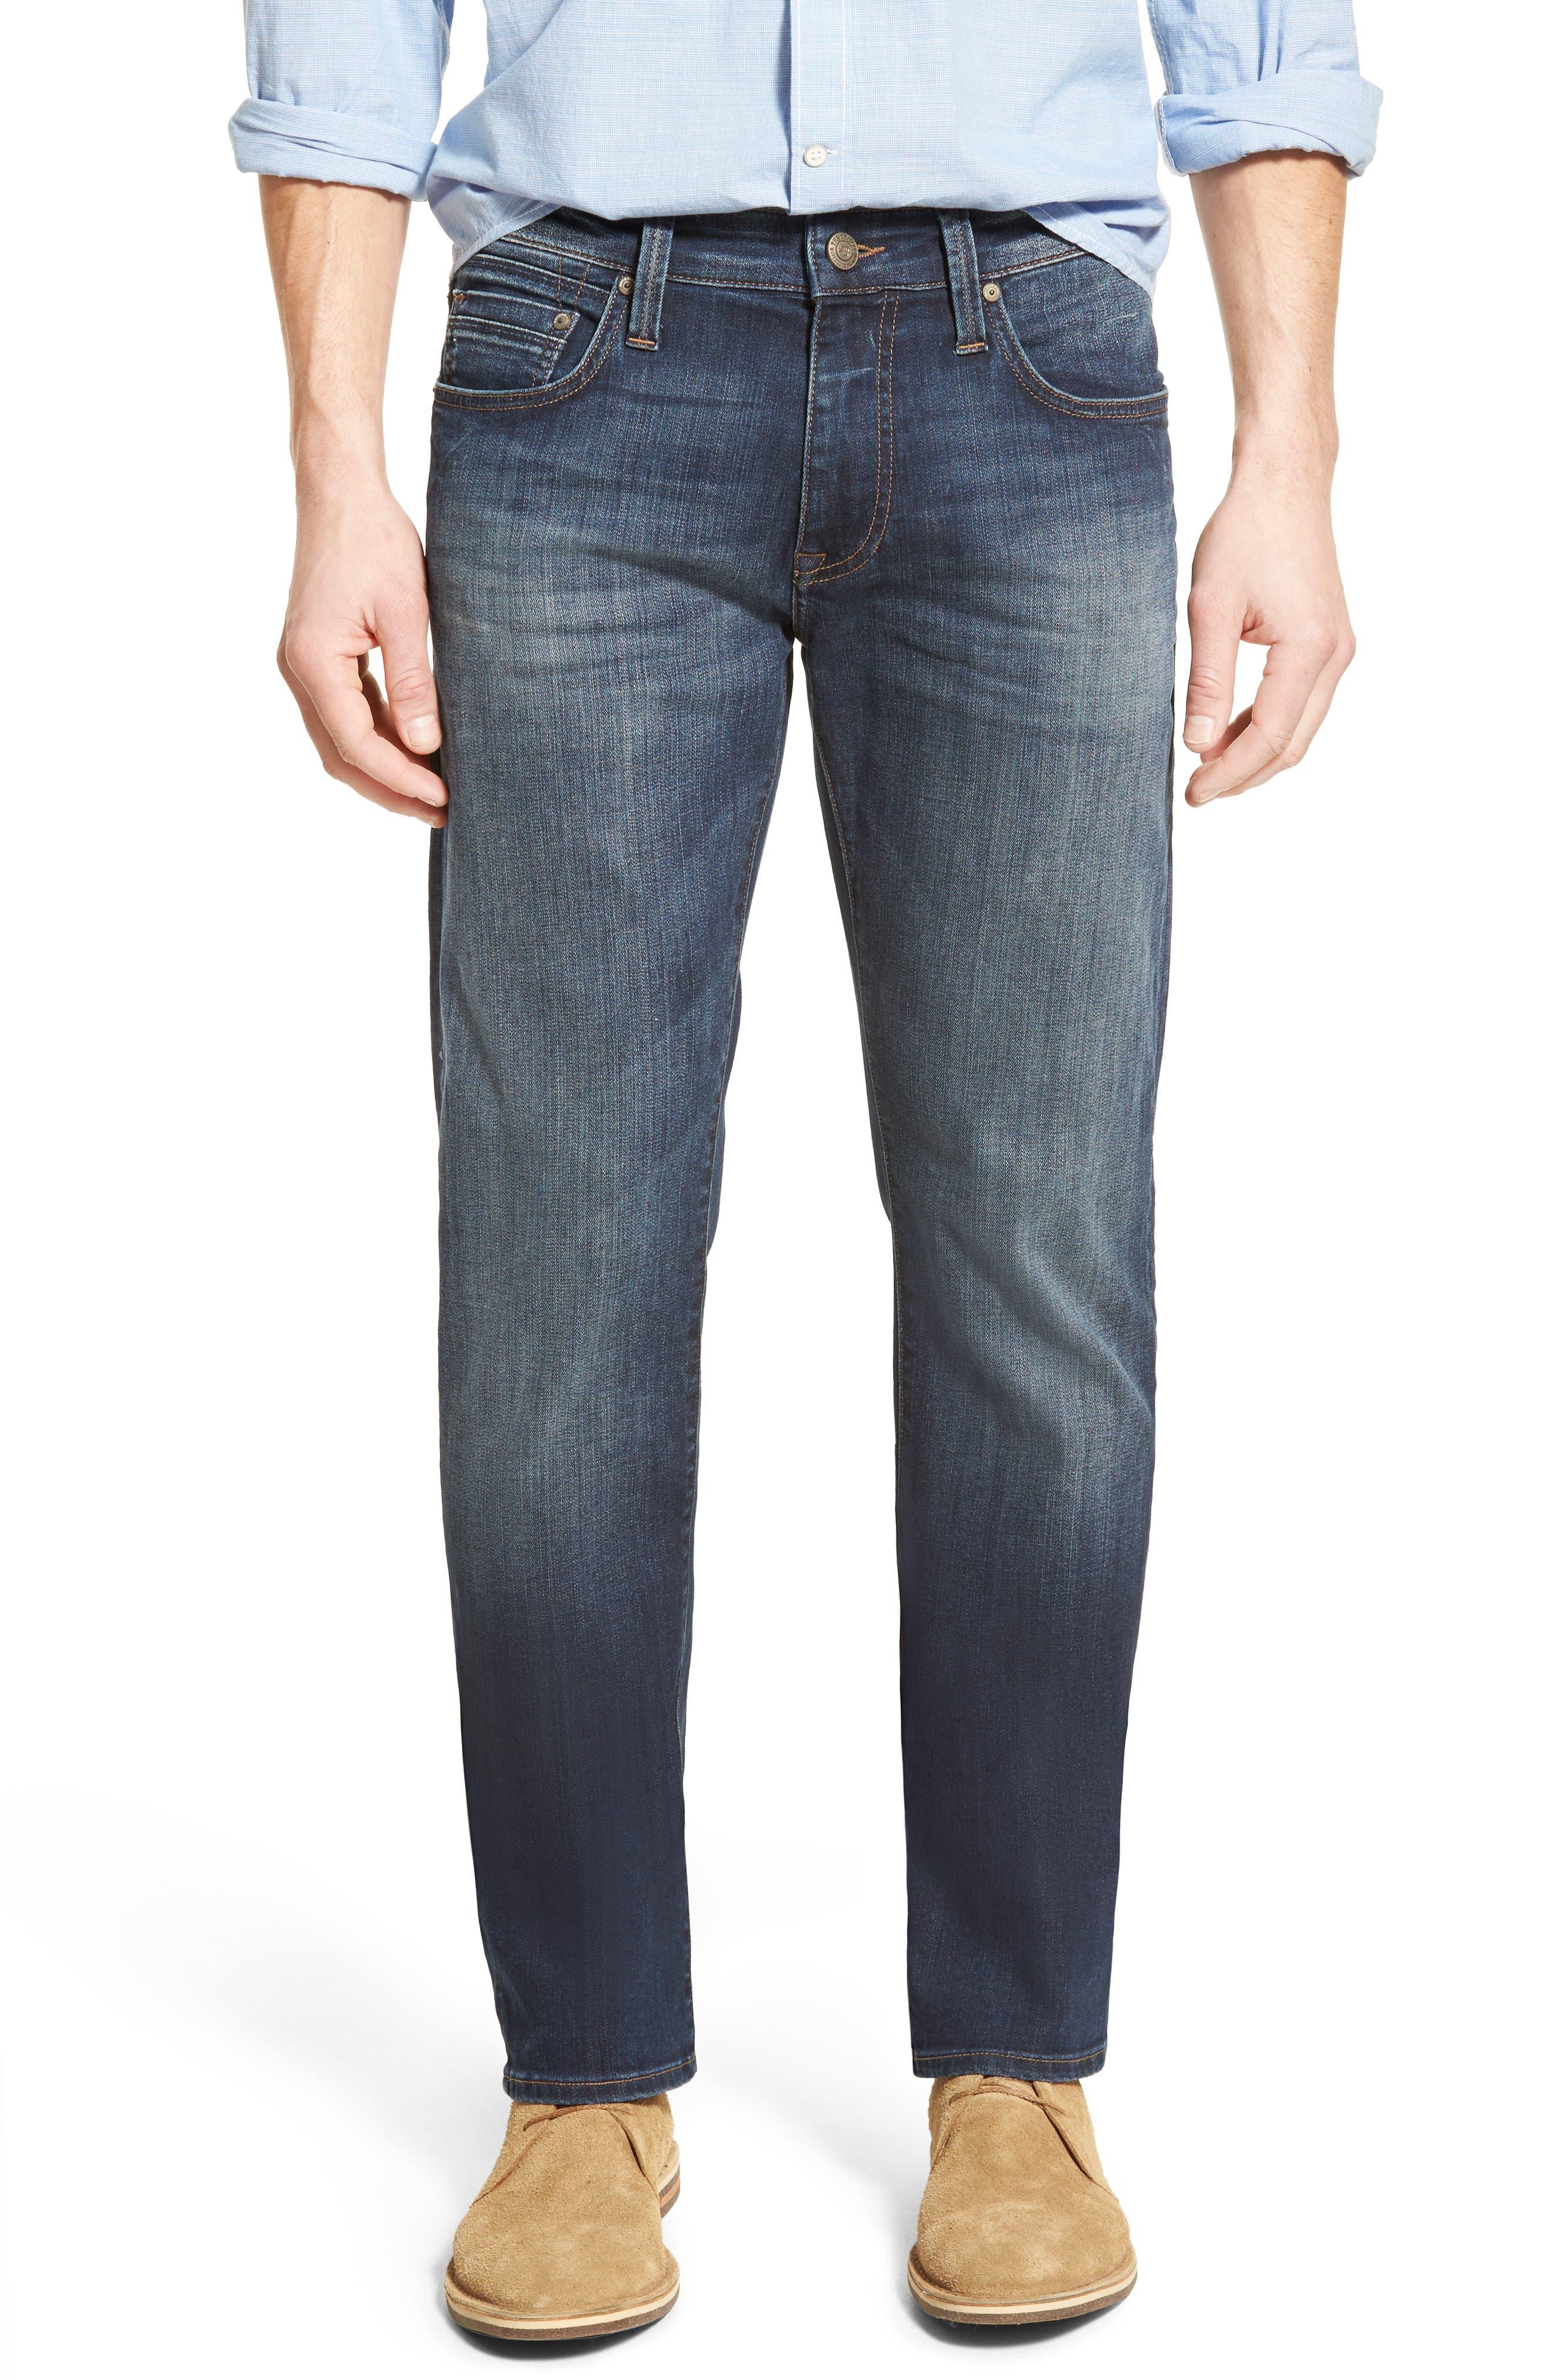 MAVI JEANS,                             Zach Straight Leg Jeans,                             Main thumbnail 1, color,                             DARK BRUSHED WILLIAMSBURG